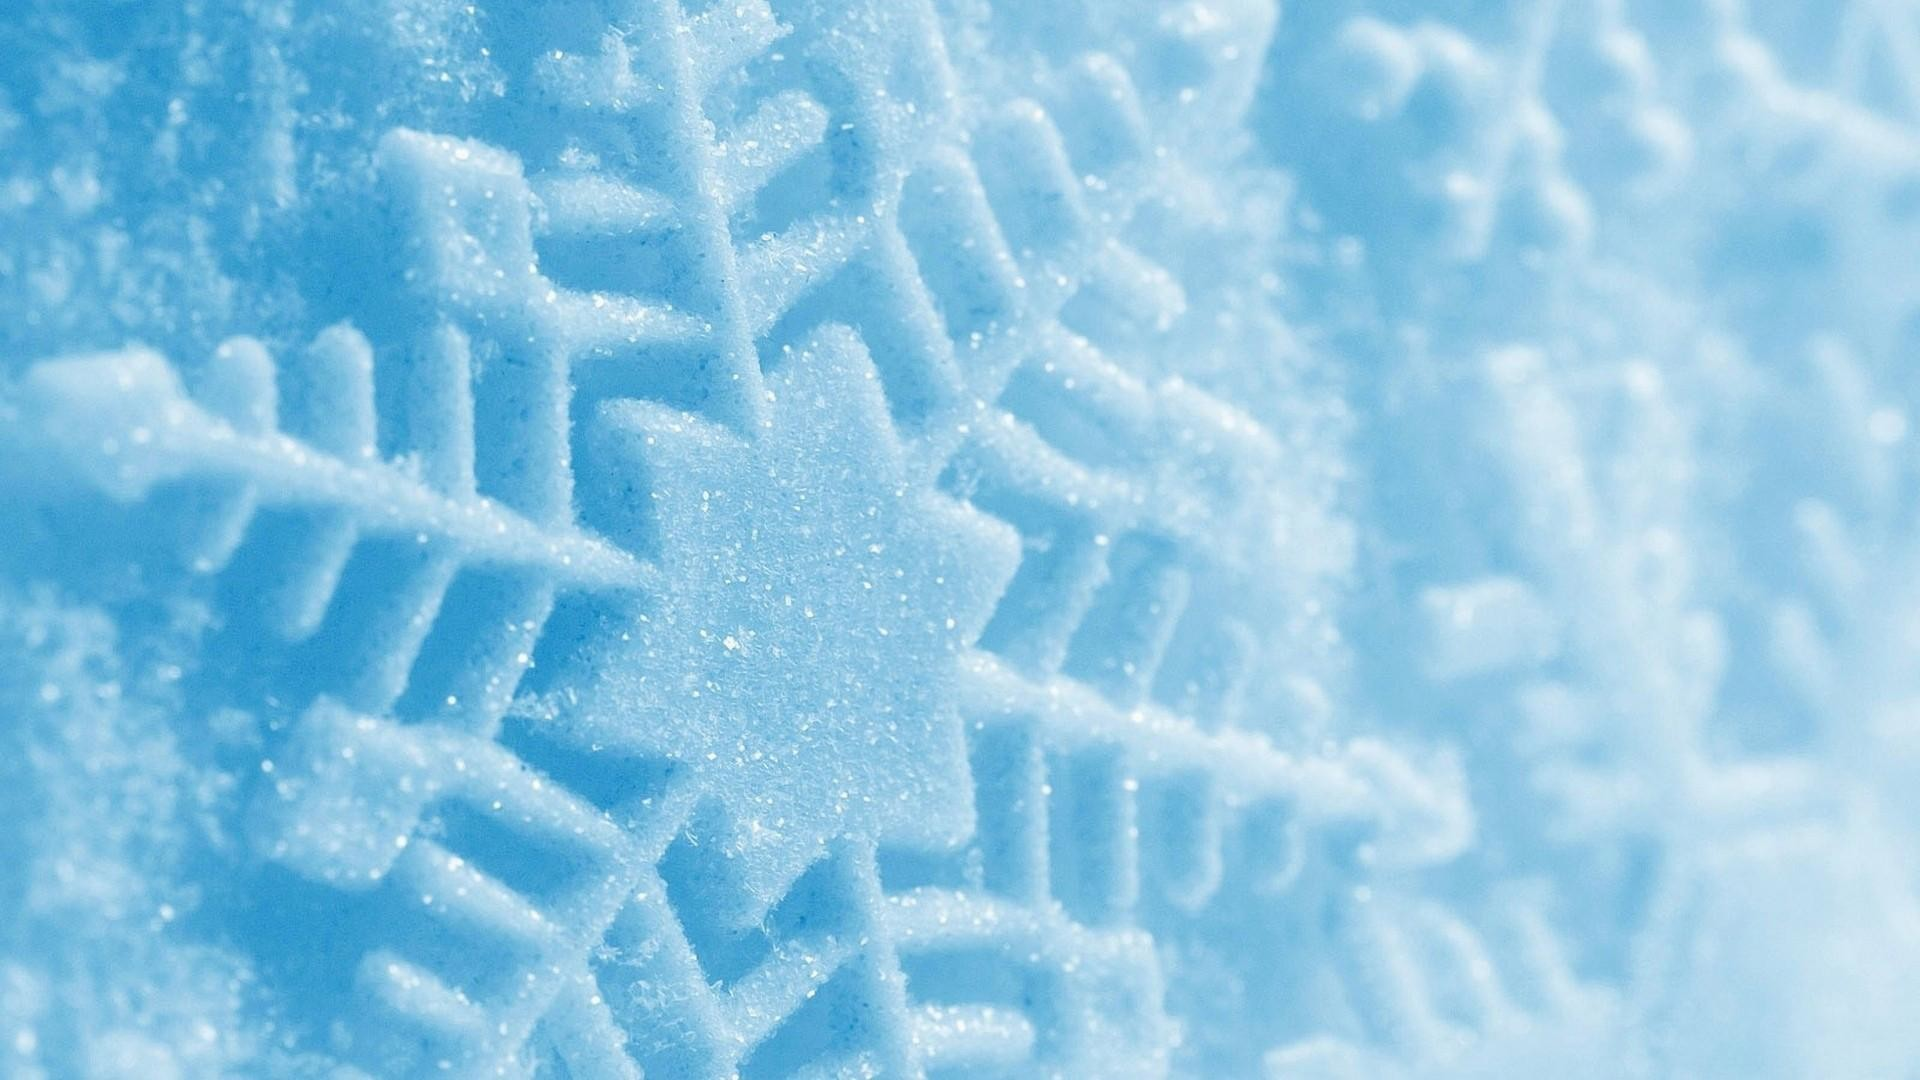 Winter-Wallpaper-Full-HD